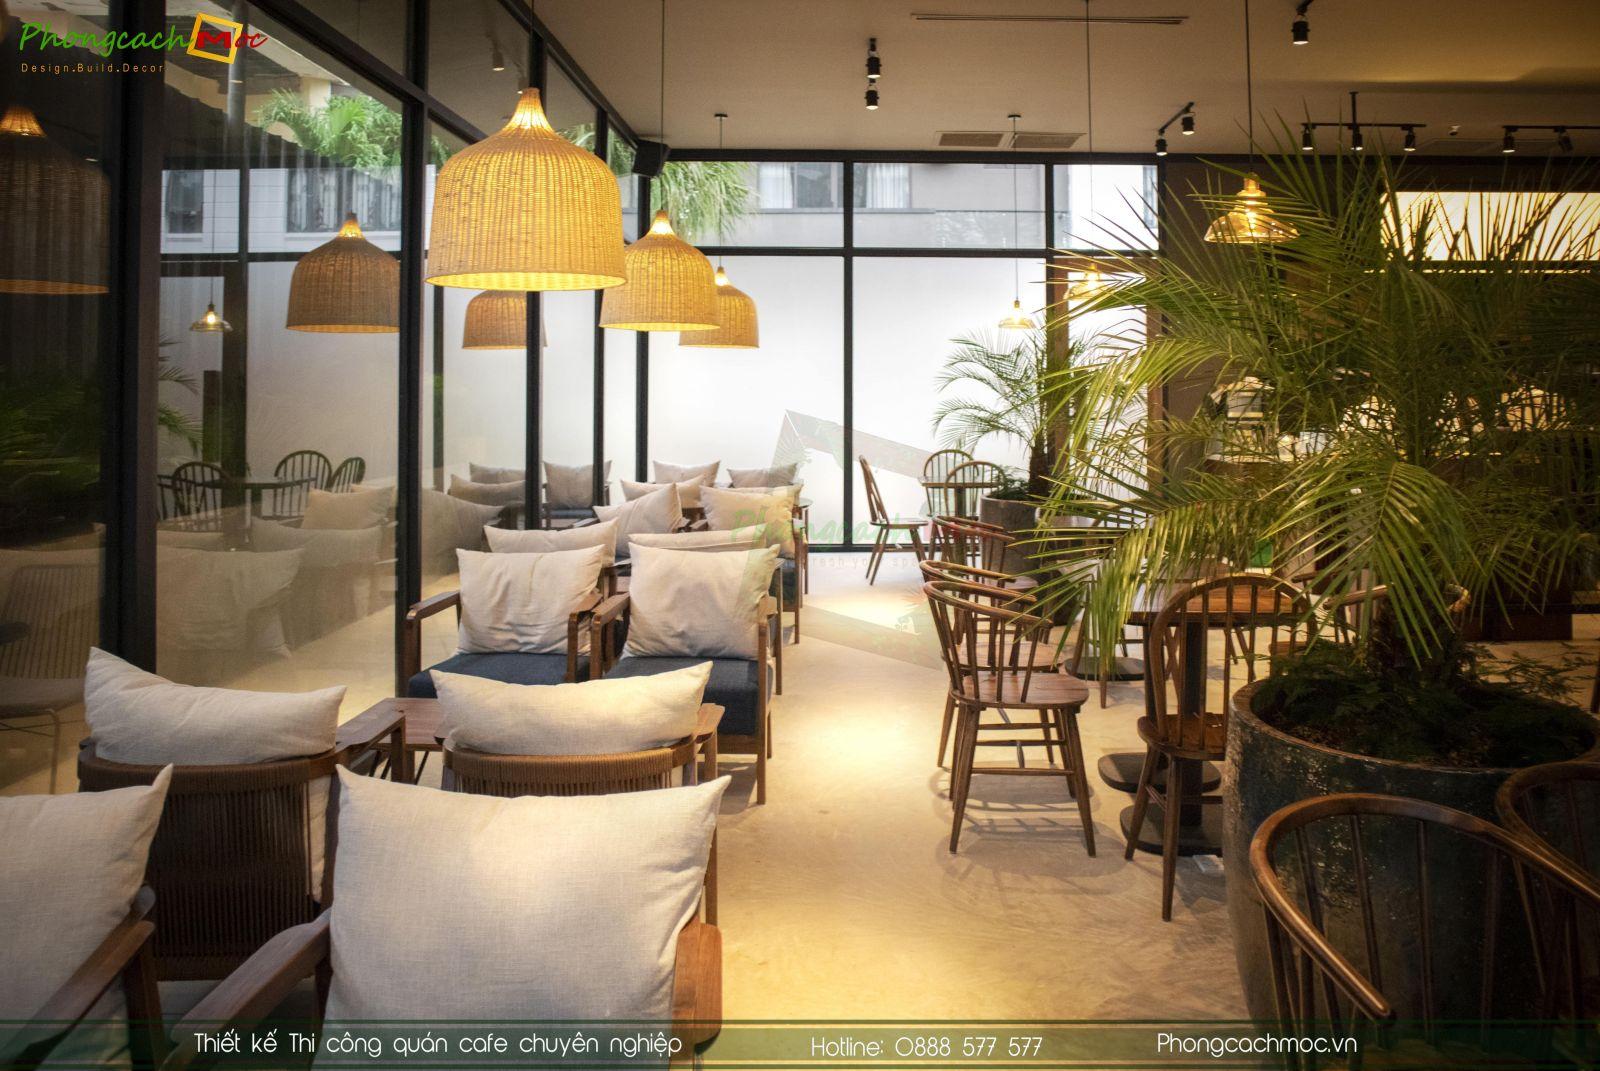 thi-cong-quan-cafe-palma-the-garden-cafe-vung-tau-17